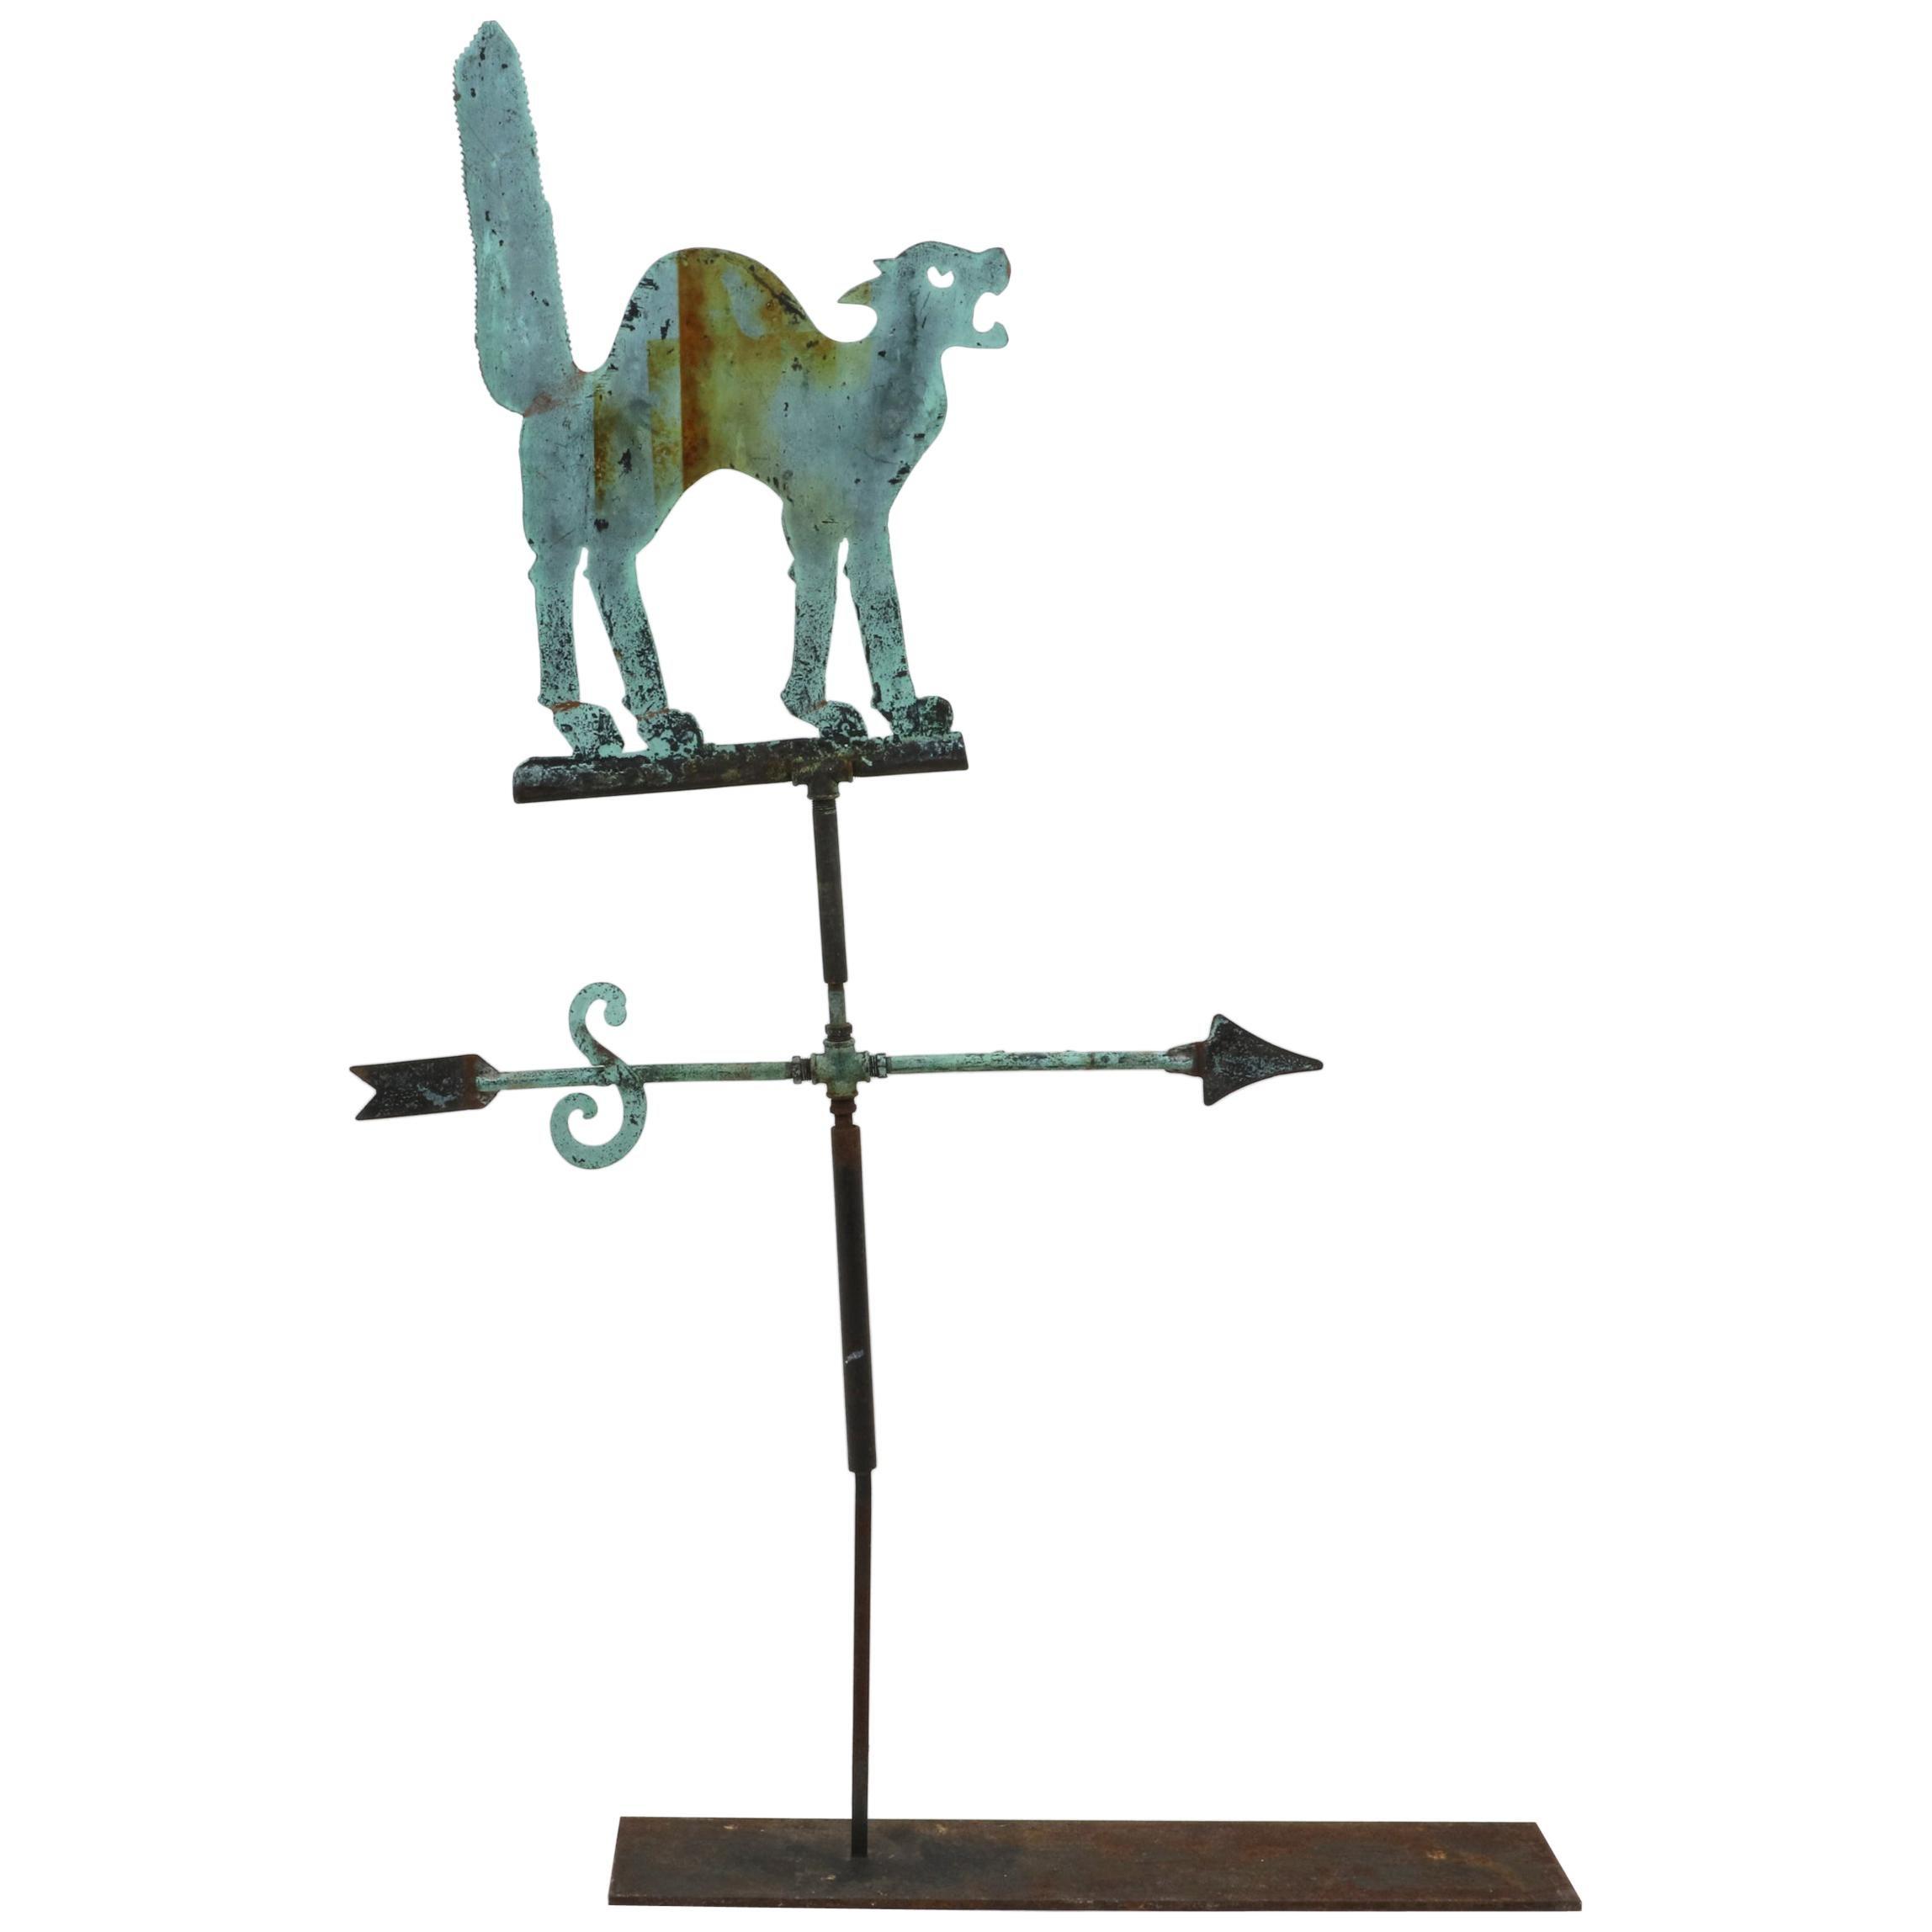 18th Century American Copper Weather Vane of Cat